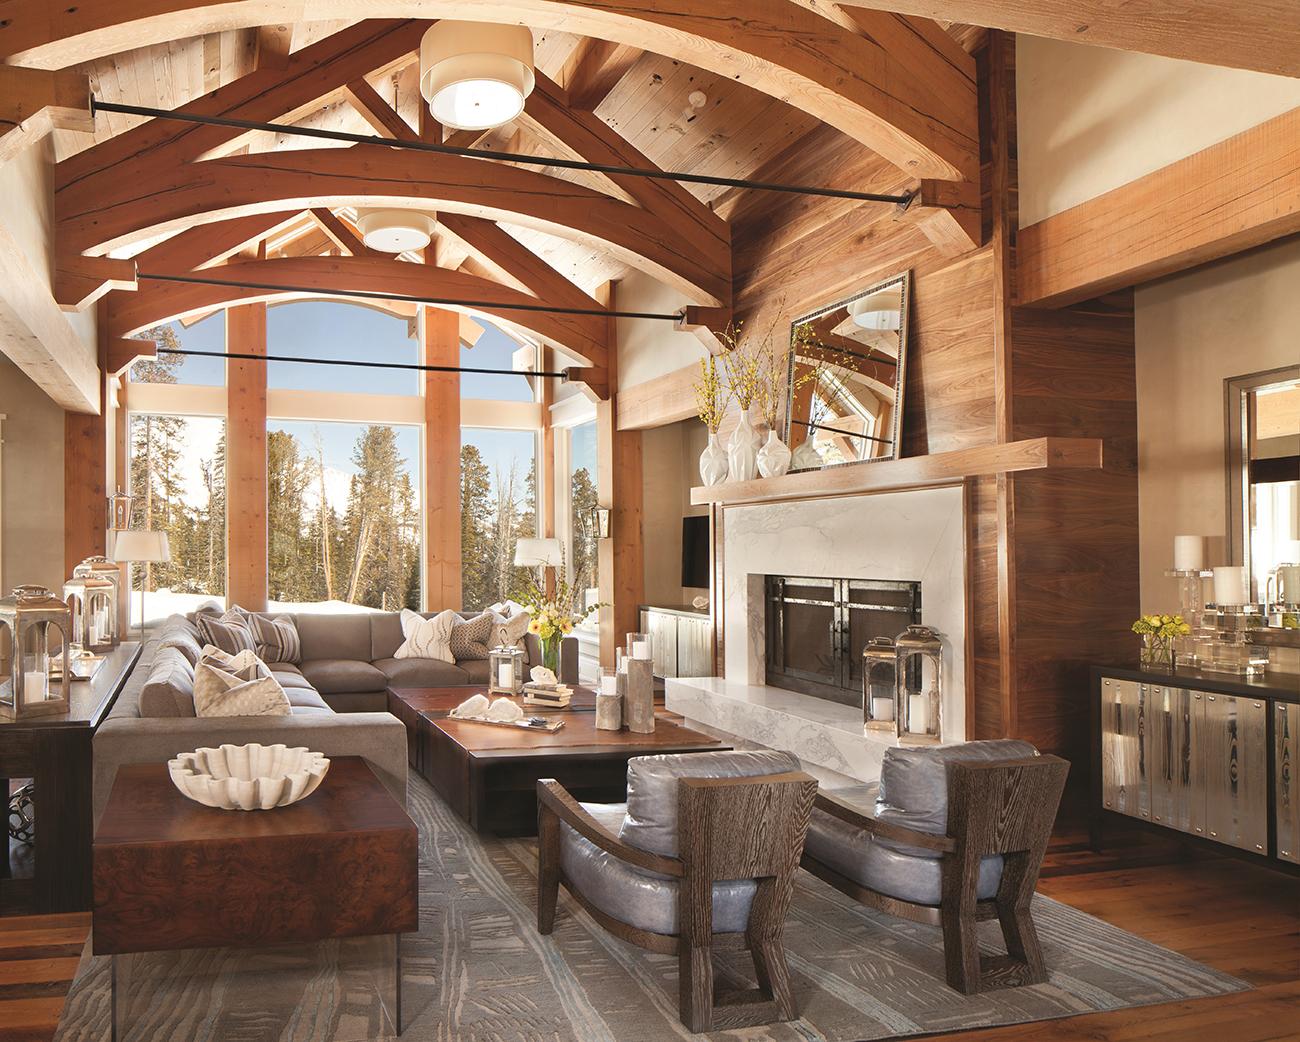 Western-style luxury.